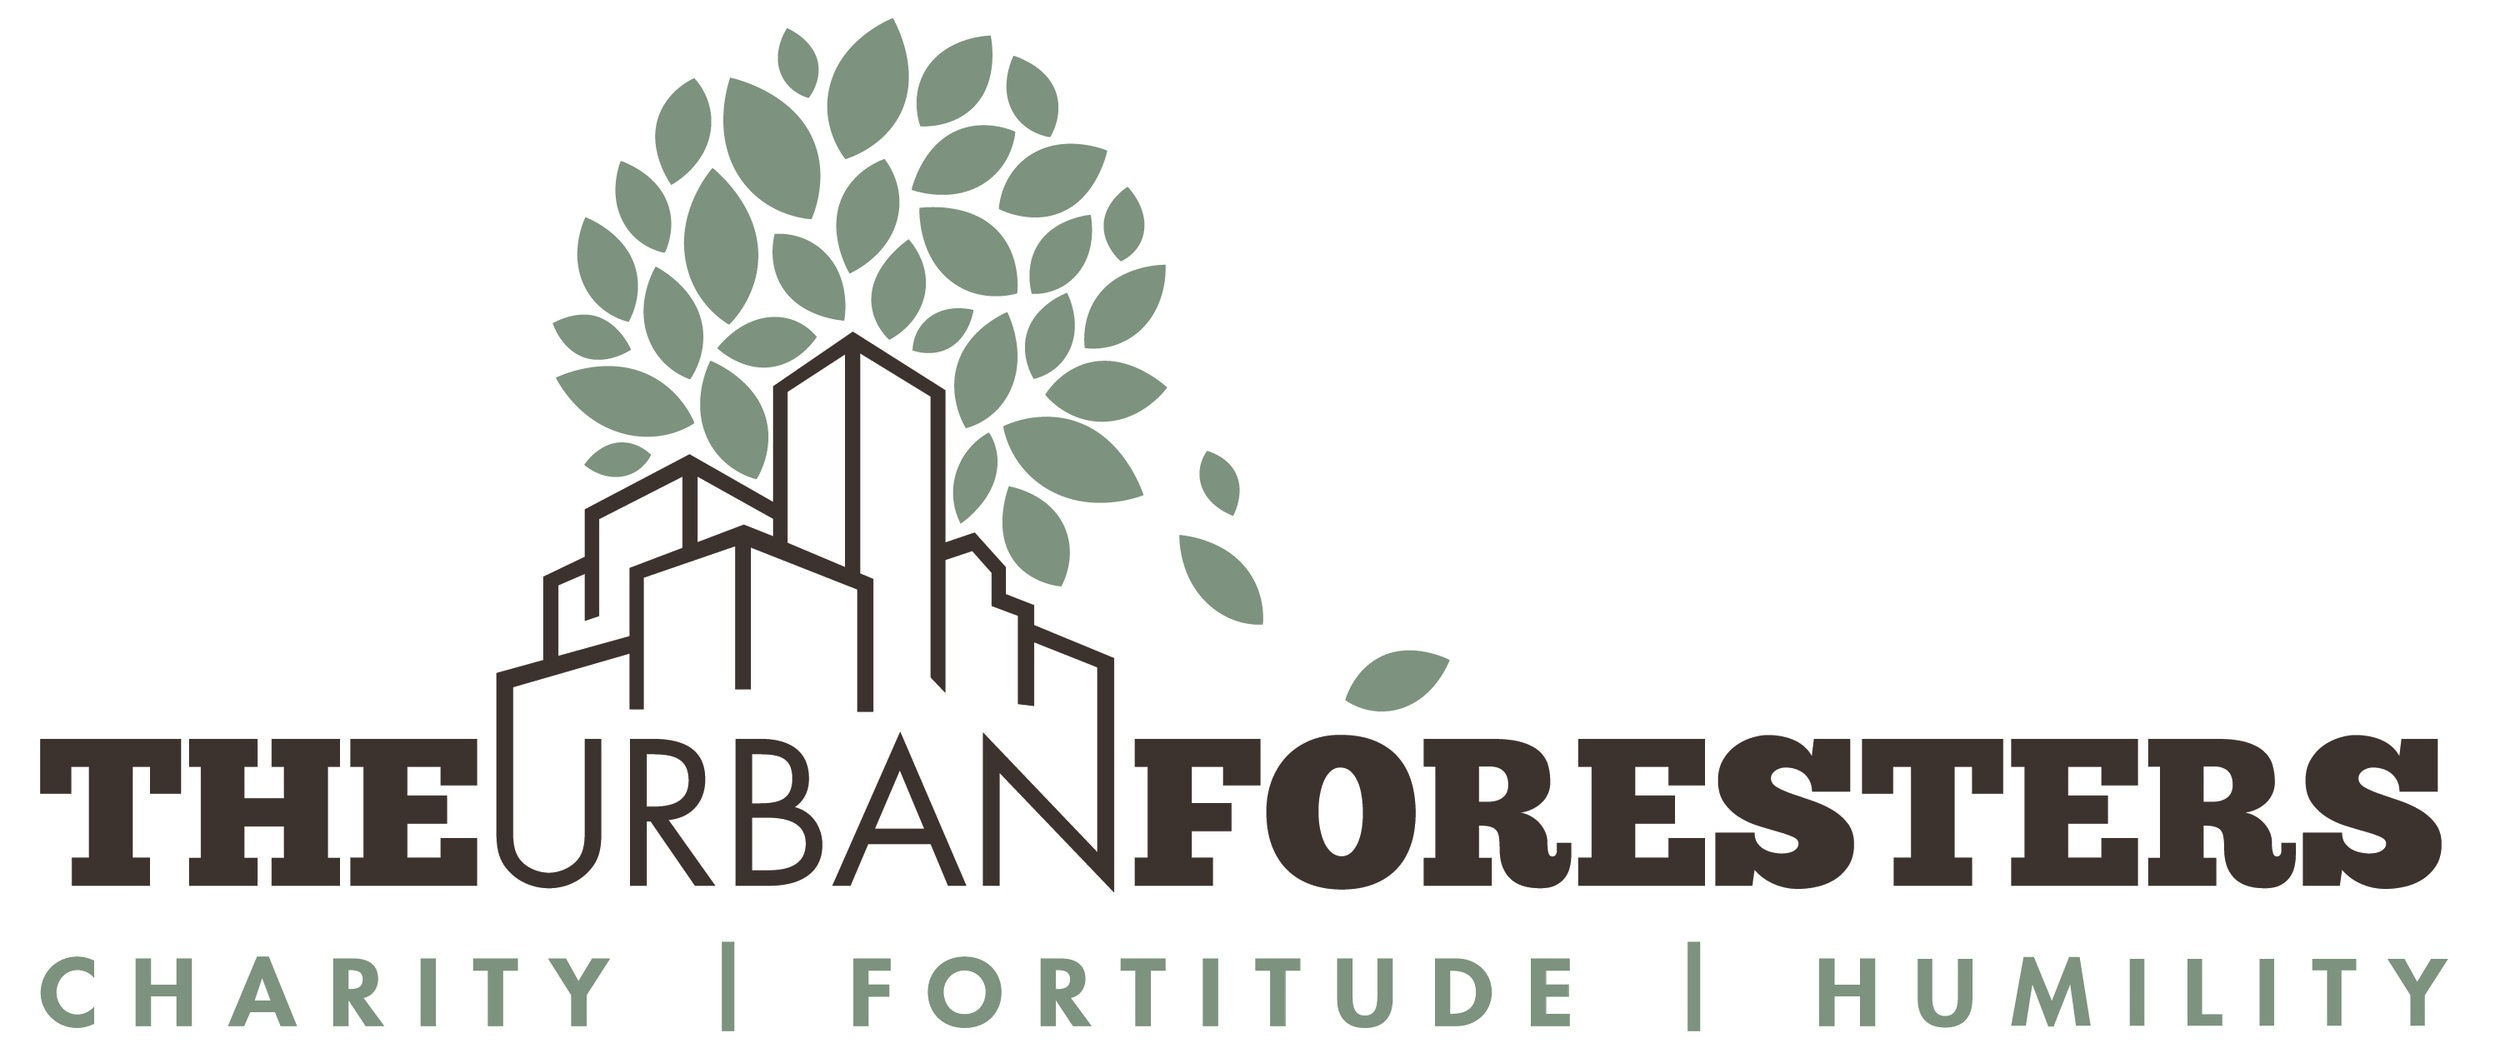 TheUrbanForesters_Logo_NewTagline-01-01%2B%25284%2529.jpg